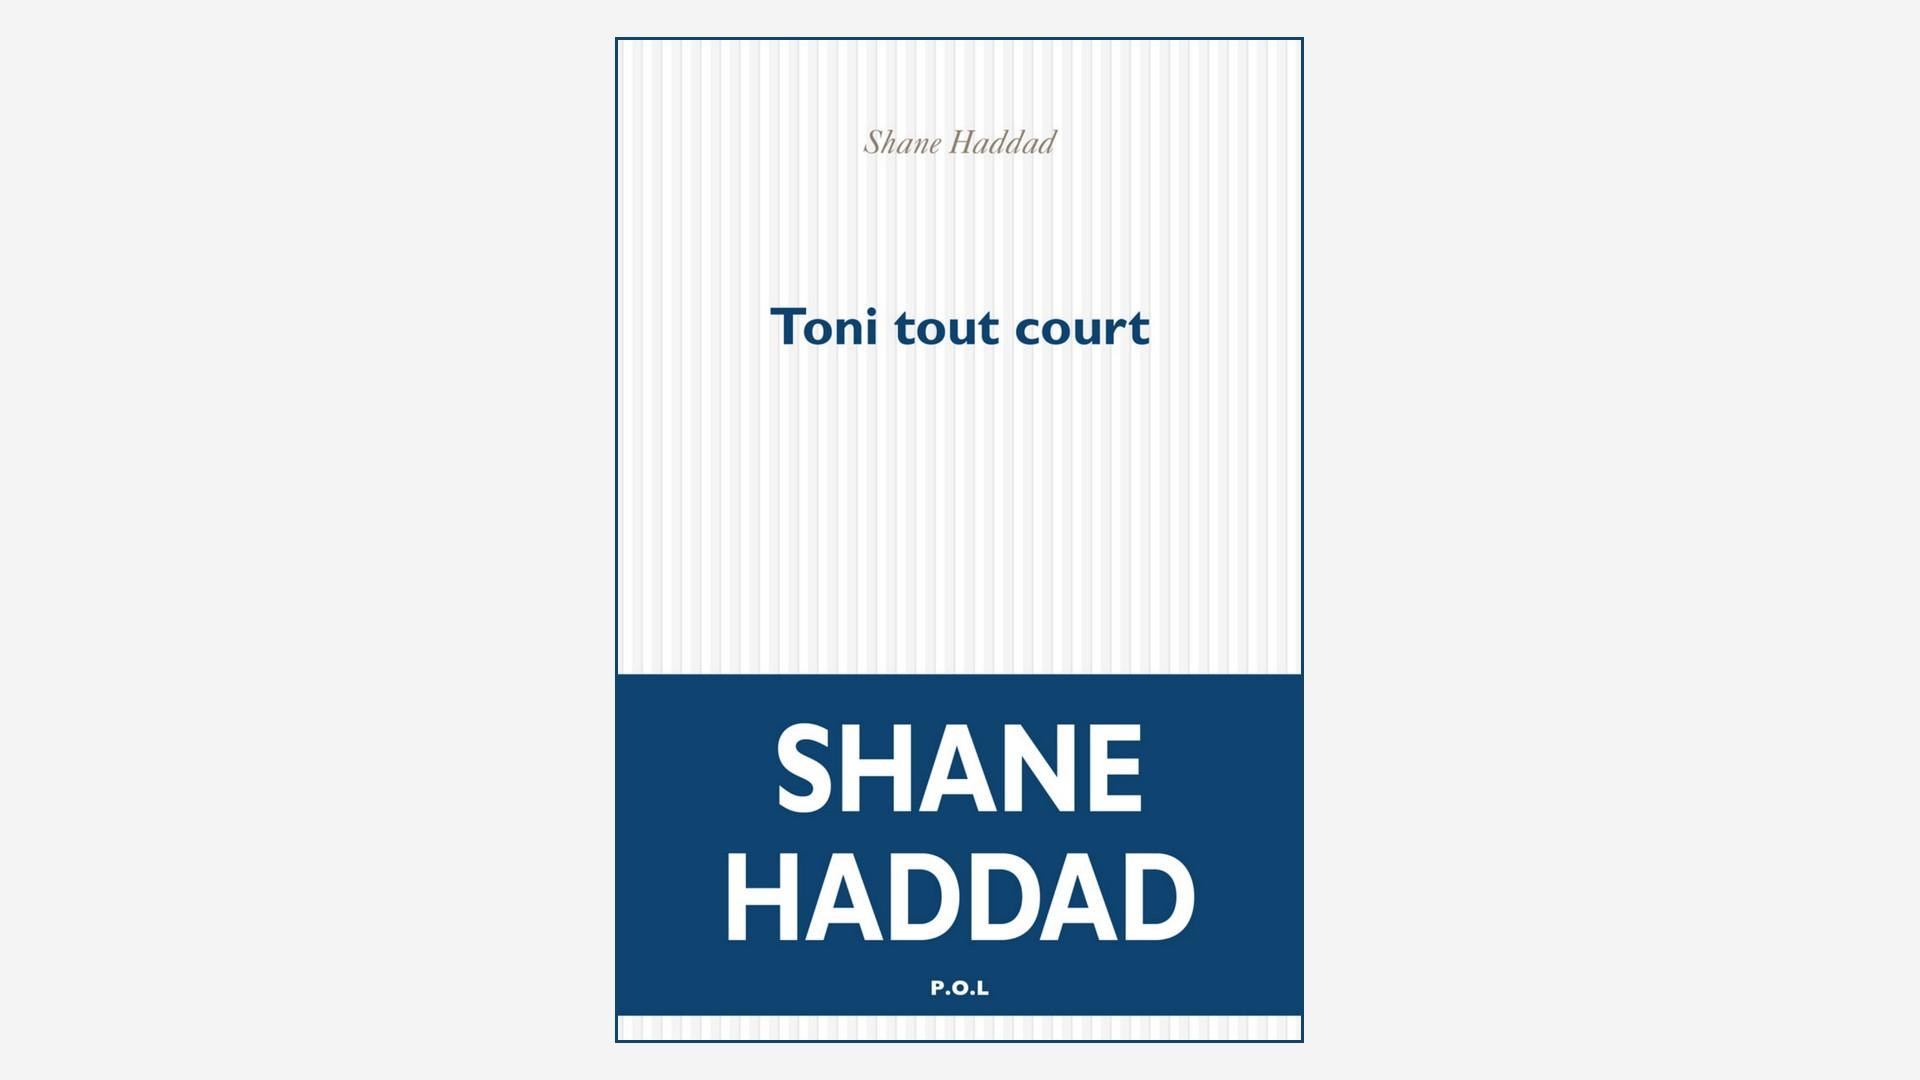 Livres – Toni tout court – Shane Haddad